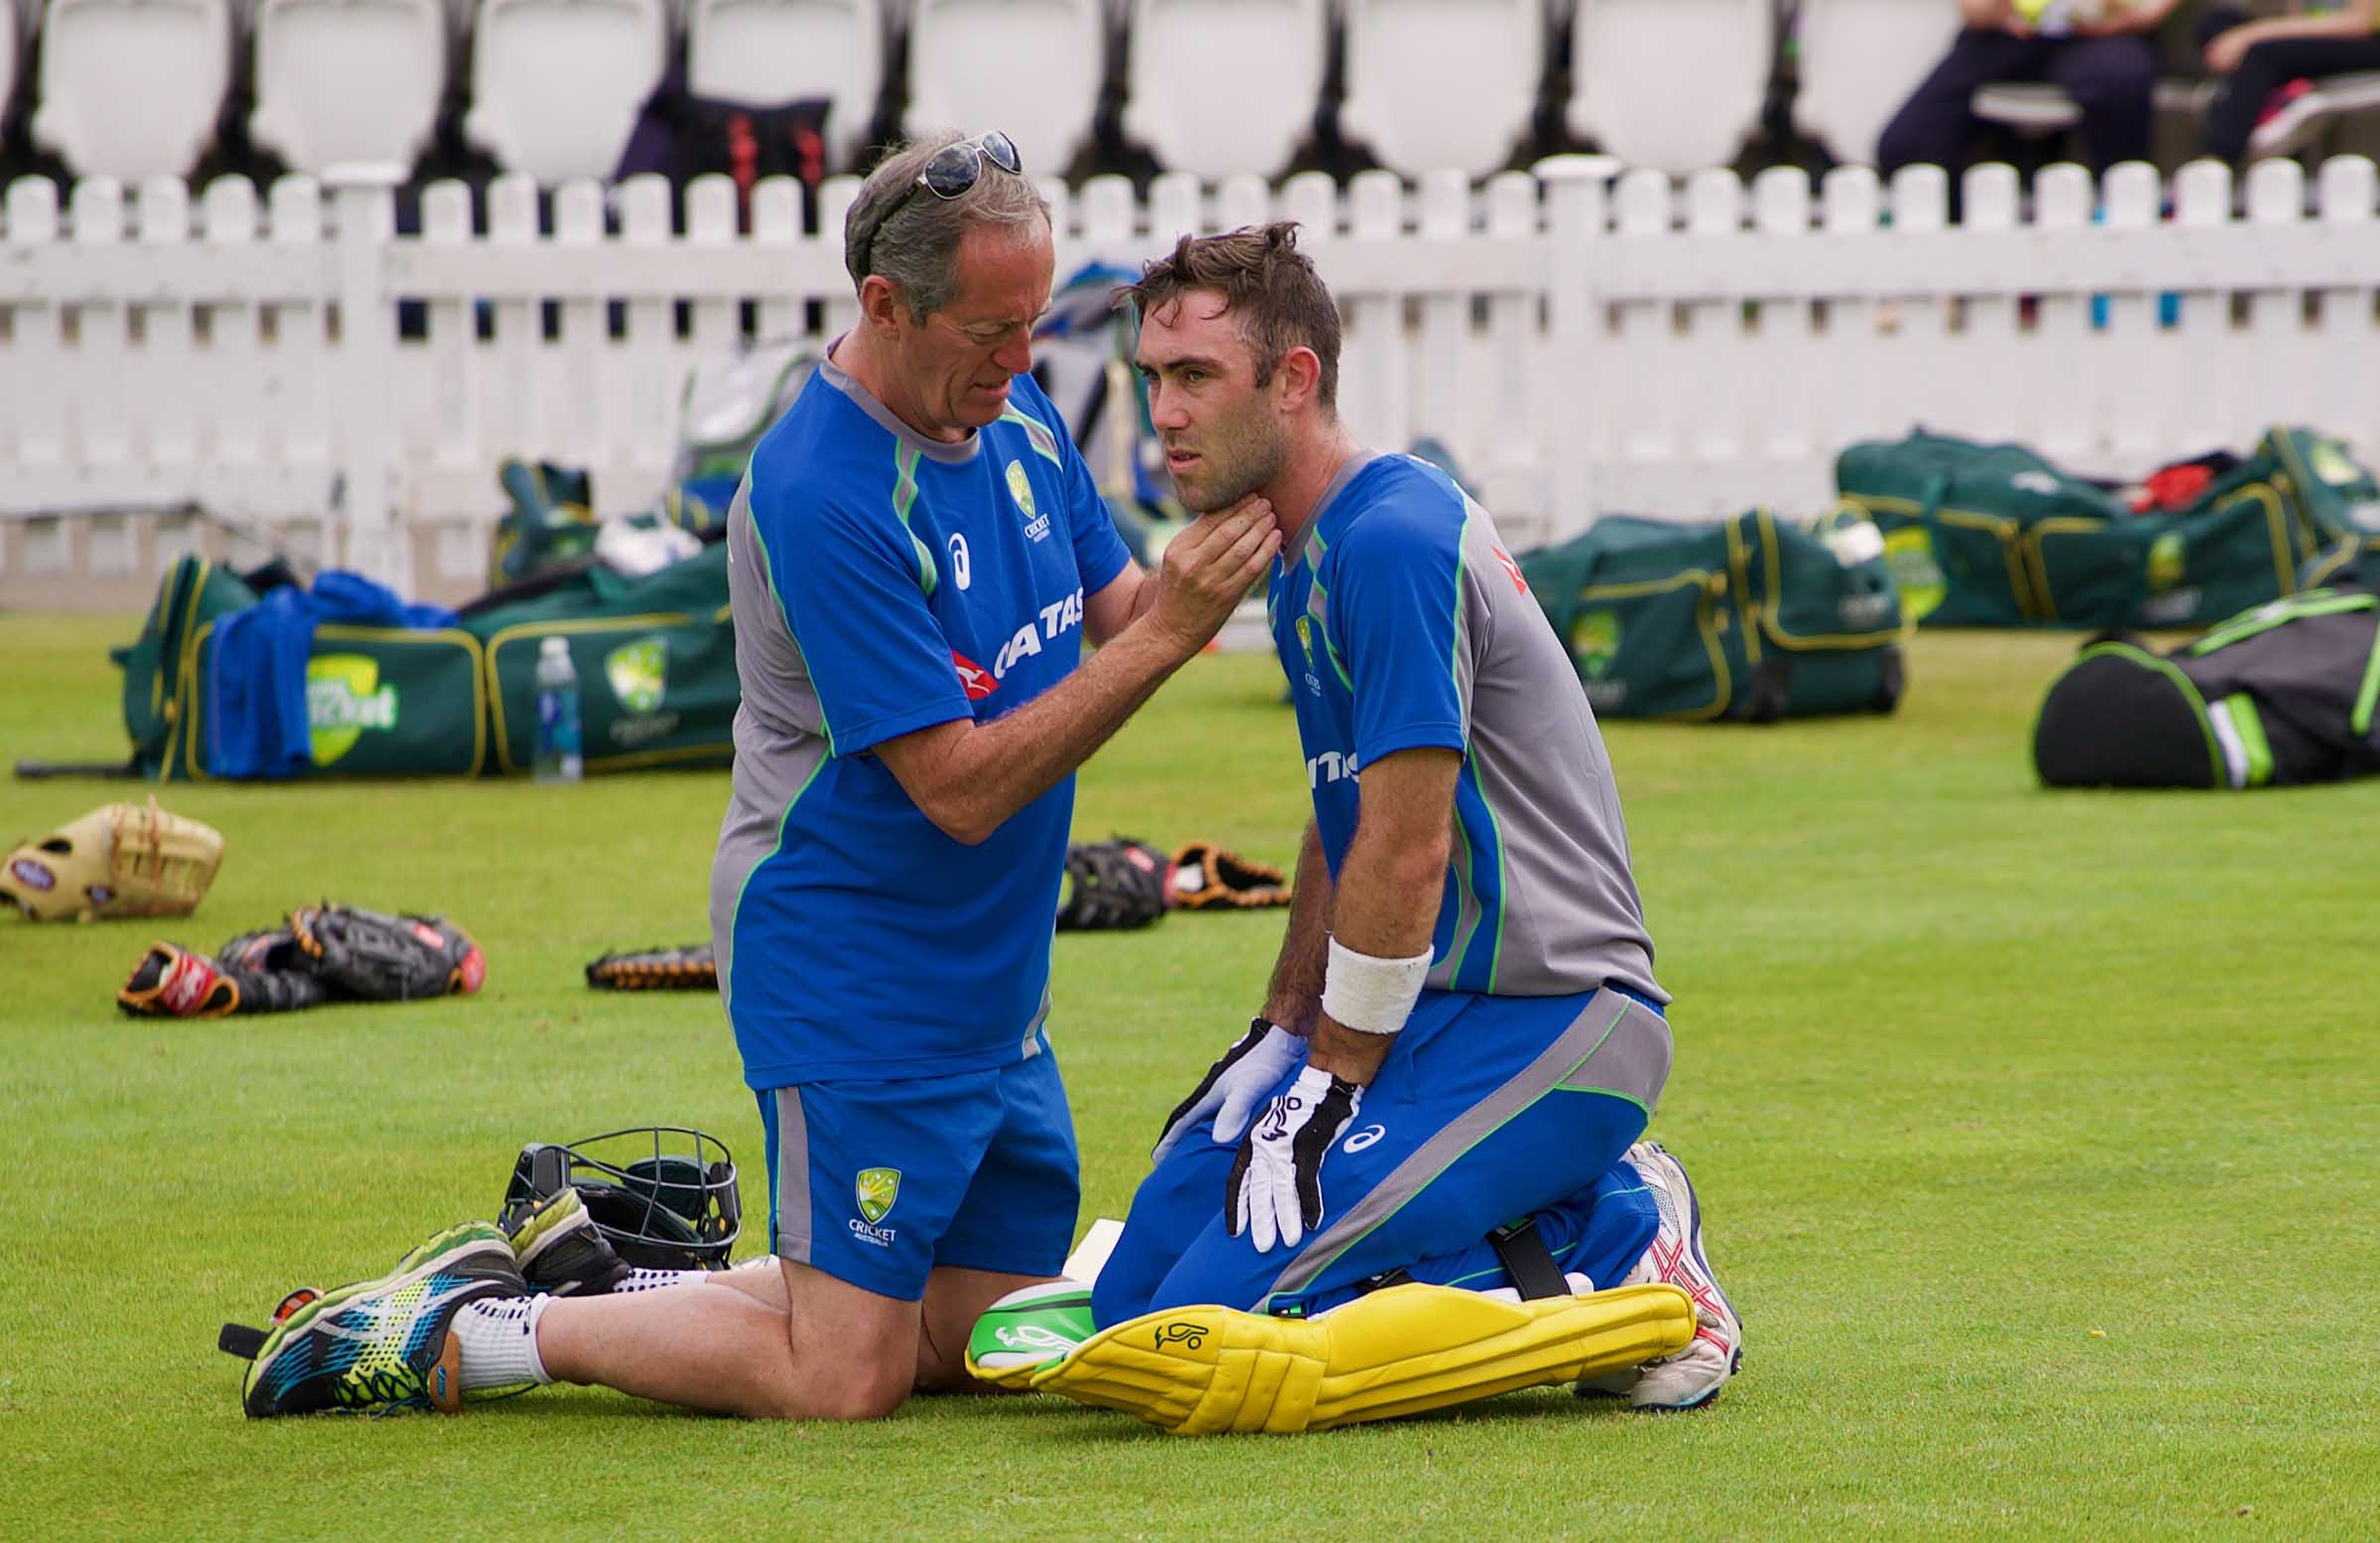 Dr Brukner treats Maxwell after he was struck // cricket.com.au